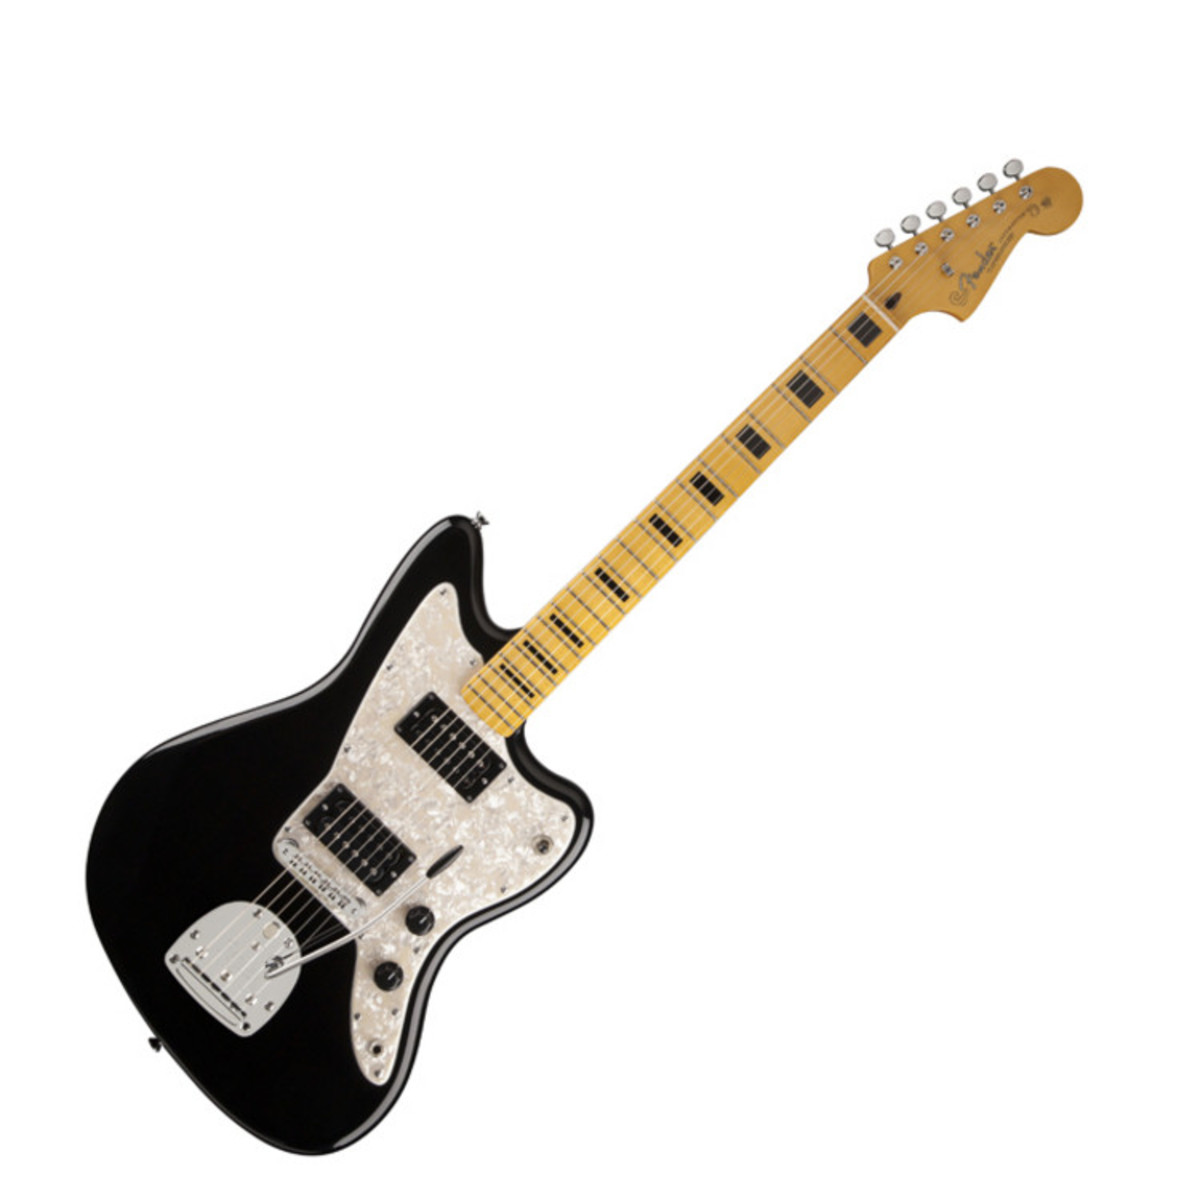 fender modern player jazzmaster hh guitar black at gear4music ie